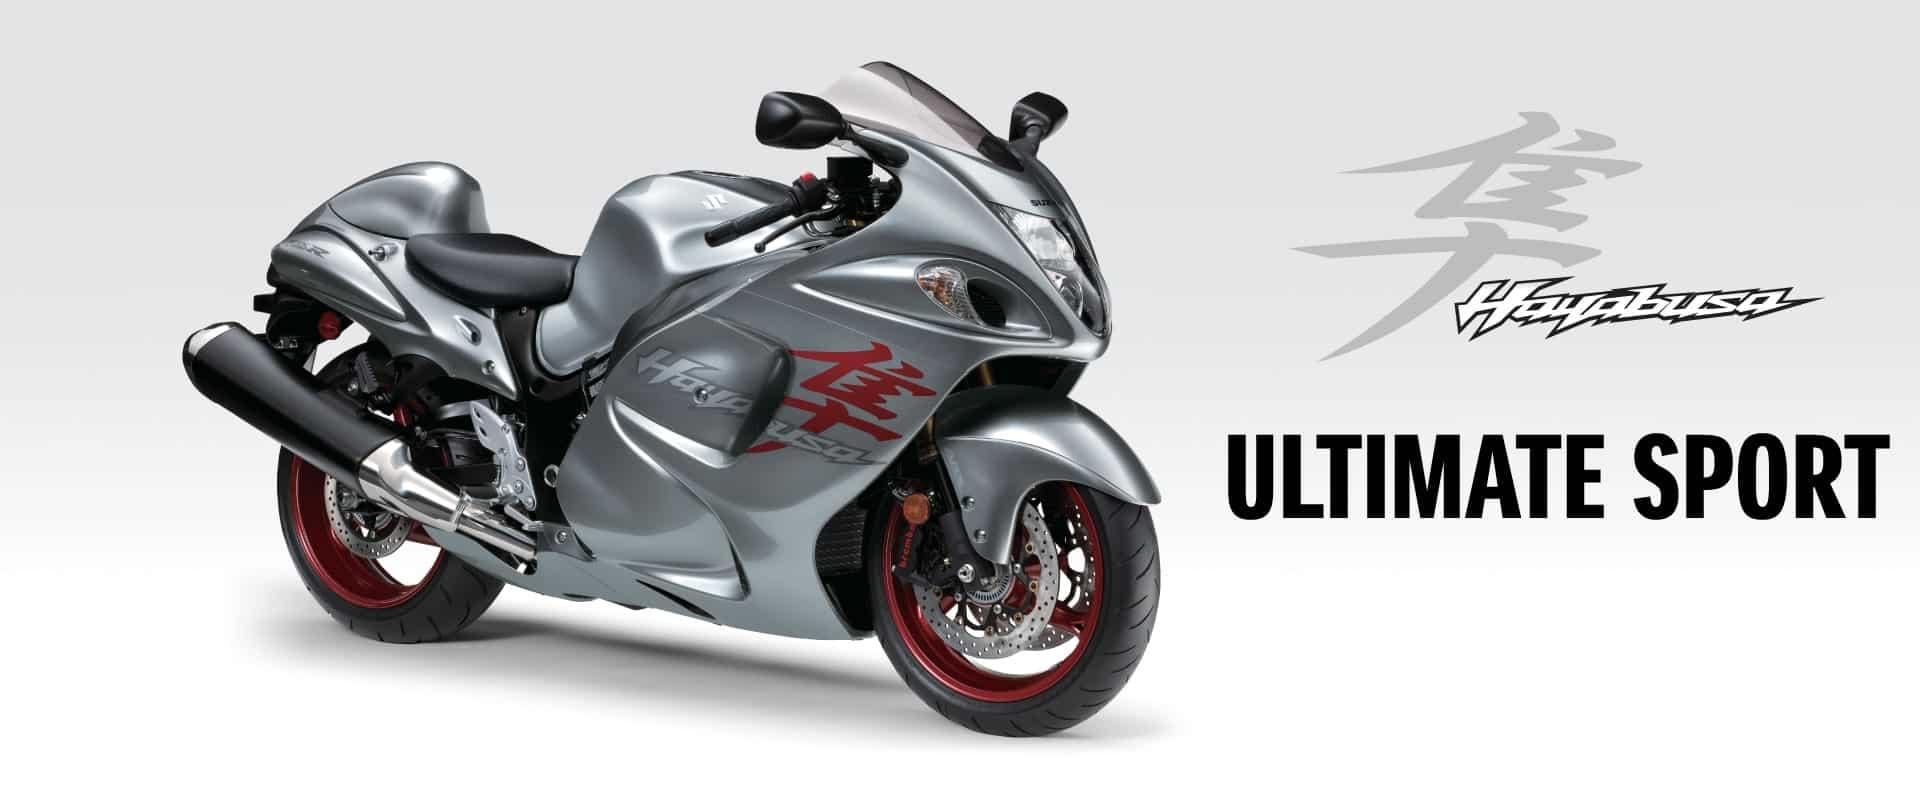 Suzuki Motorcycle launches 2019 edition of sportsbike ...